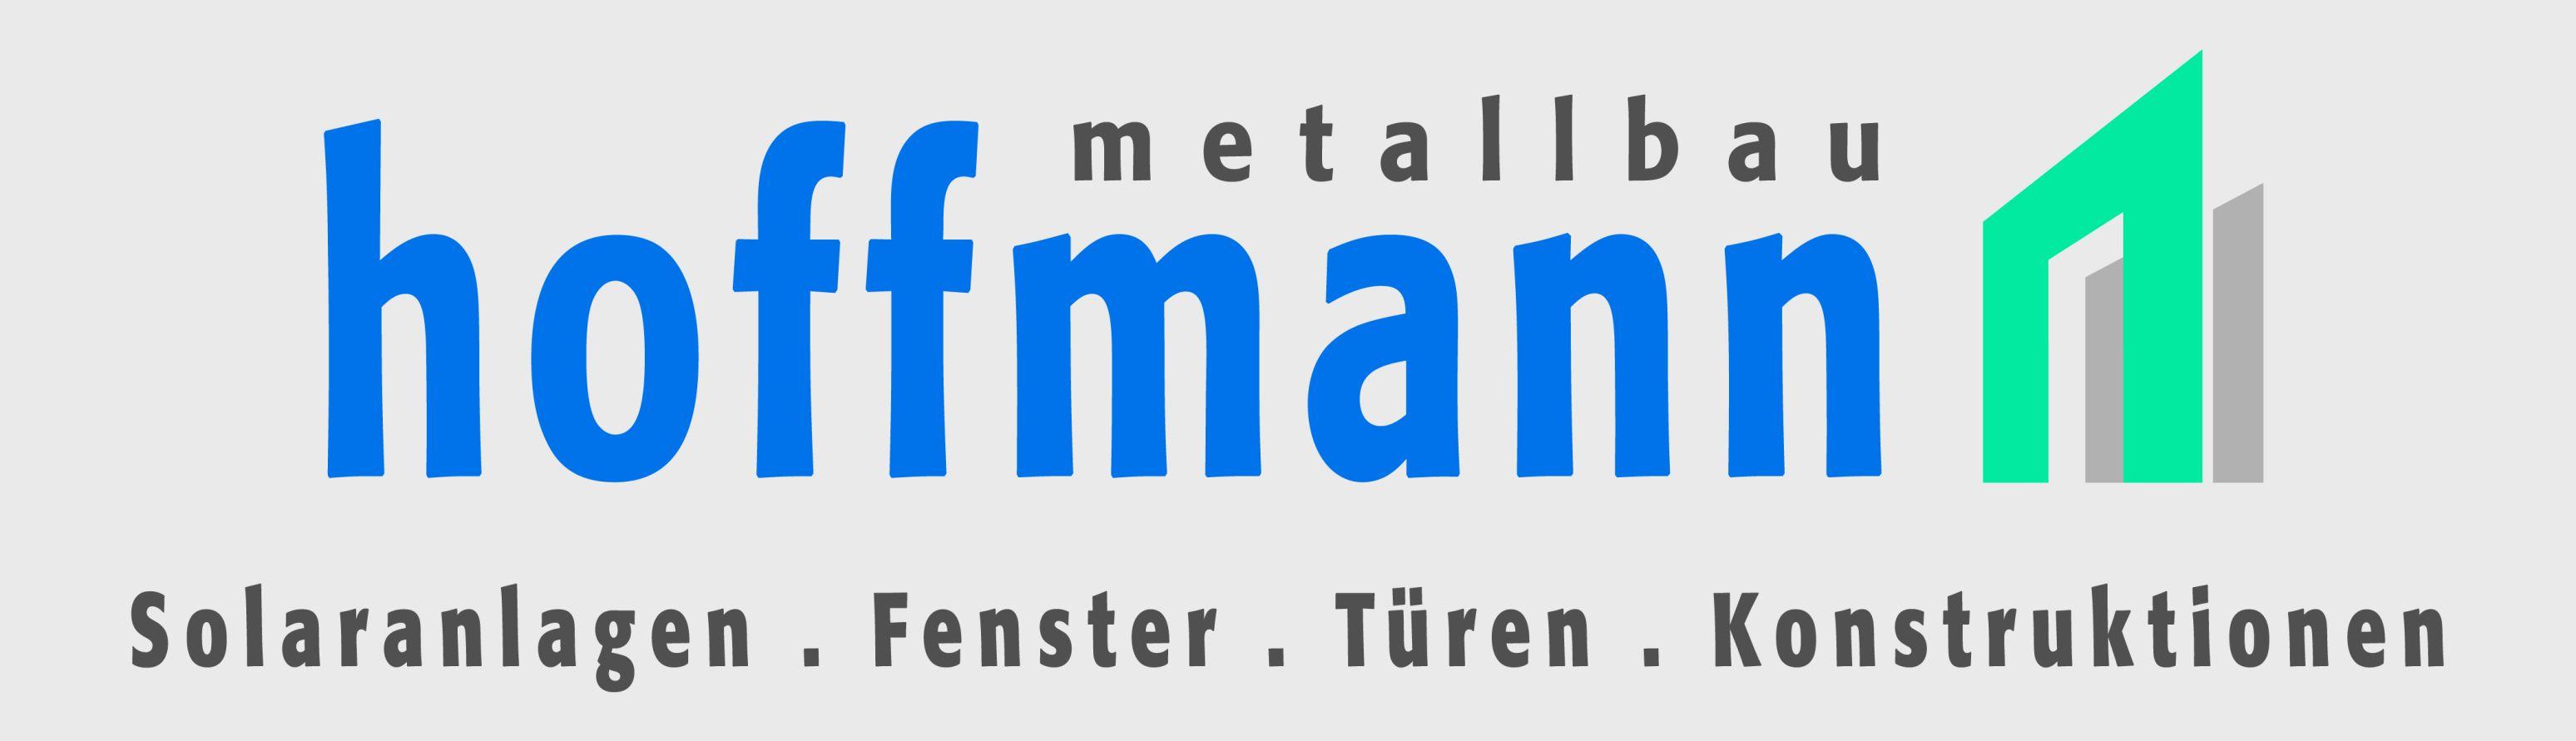 Hoffmann Metallbau